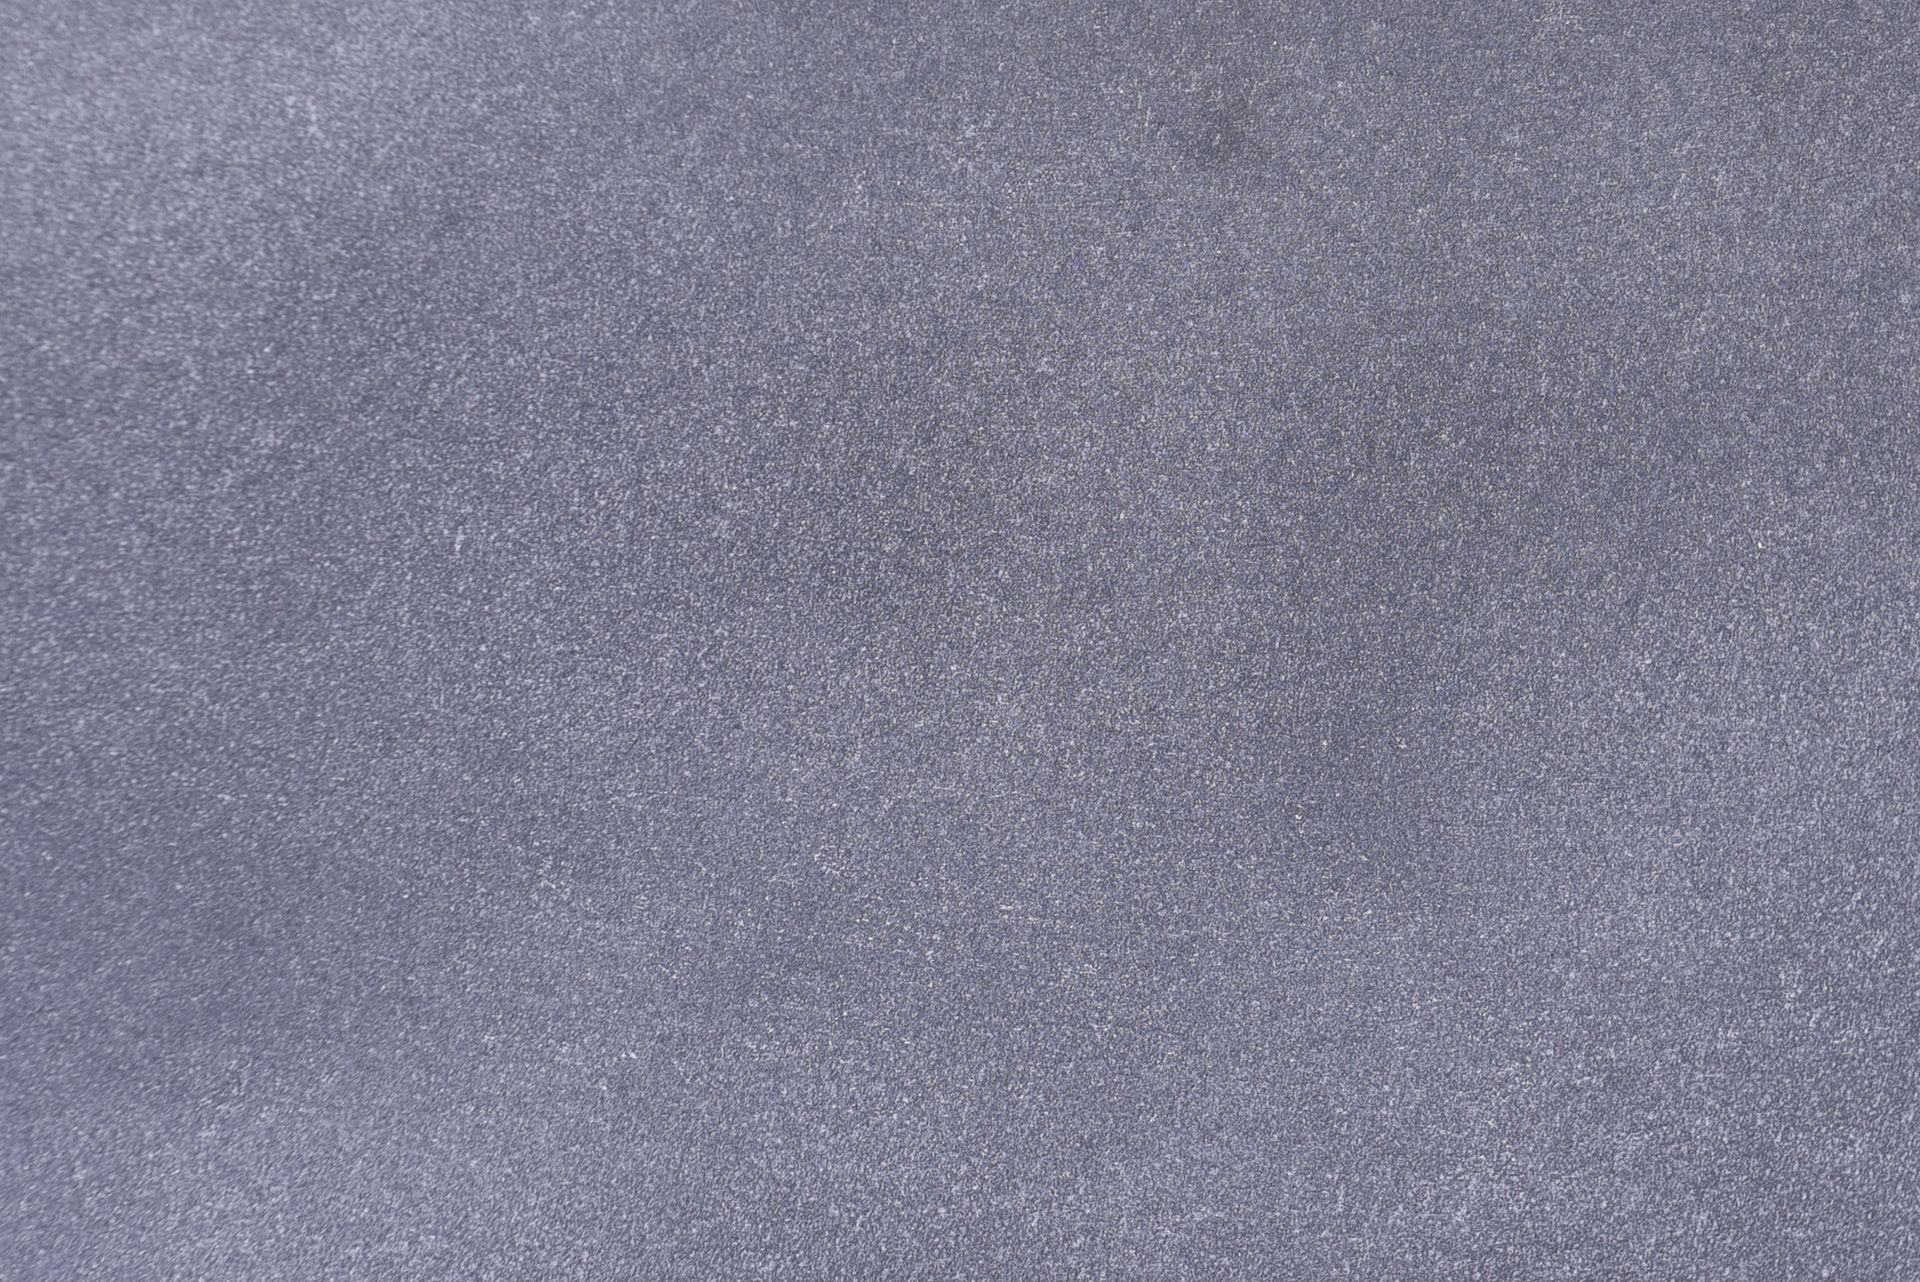 blumenkasten balkonkasten pflanzkasten aus beton flobo 80 cm grau ebay. Black Bedroom Furniture Sets. Home Design Ideas